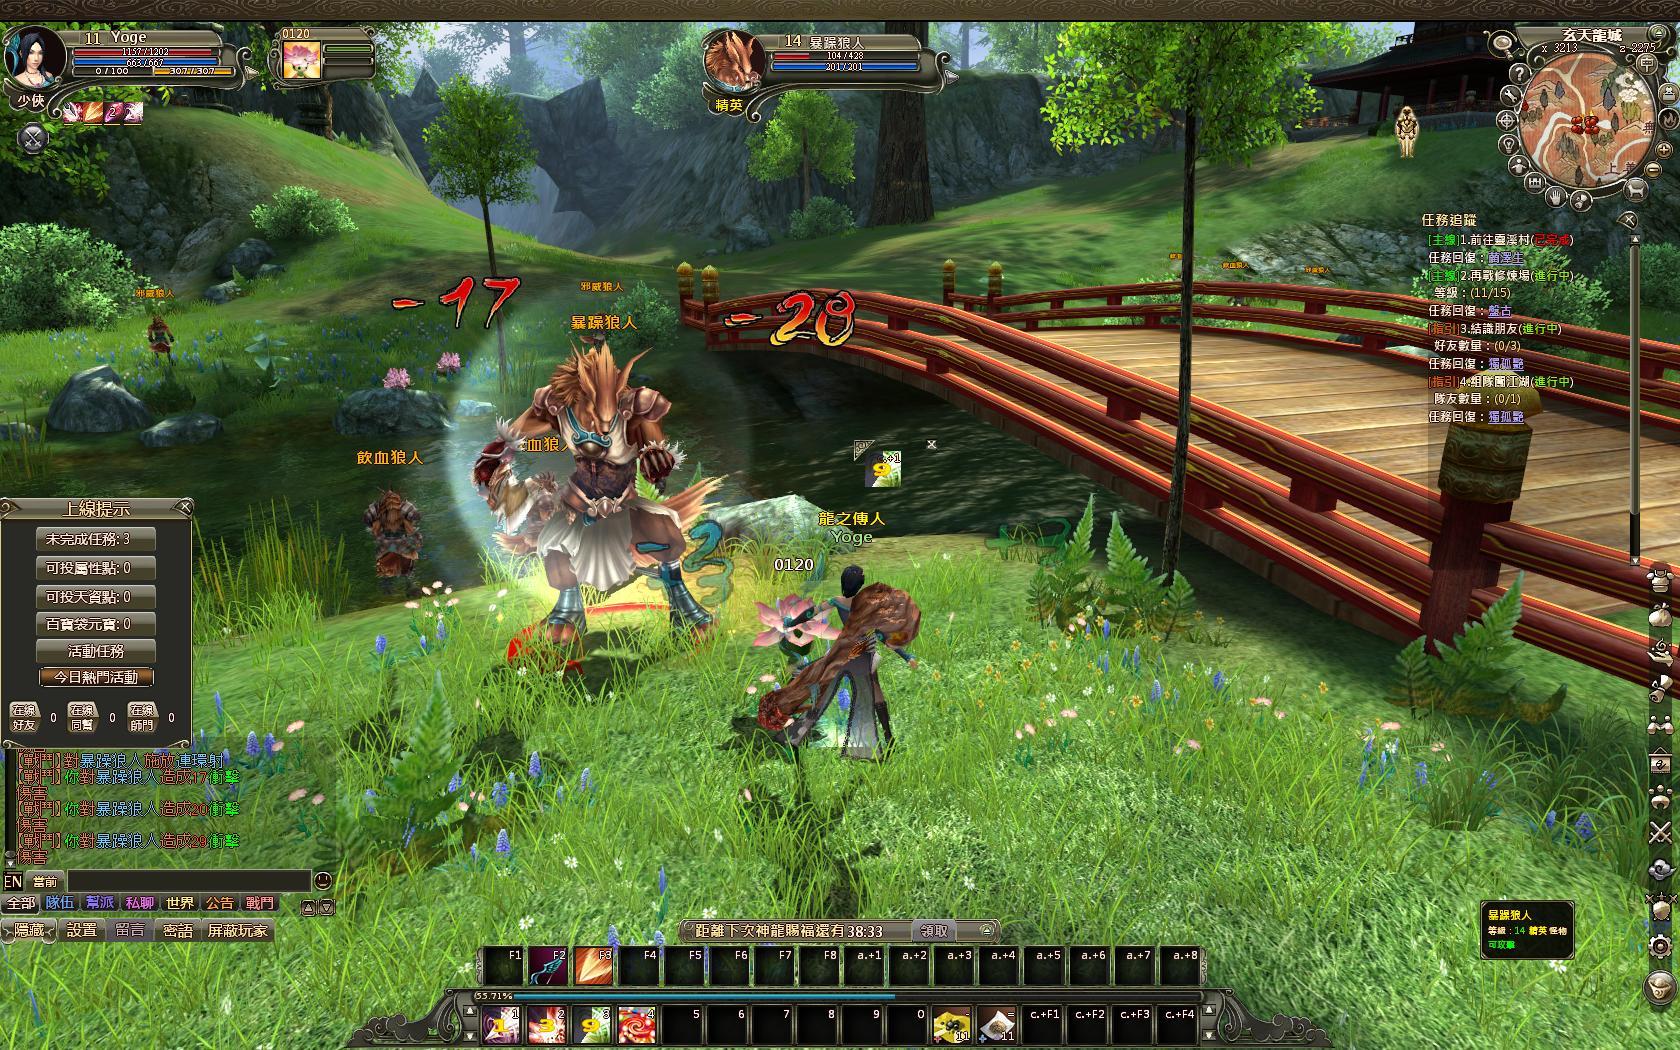 LoongScreenshot[10-8-2010 002850]-44036425